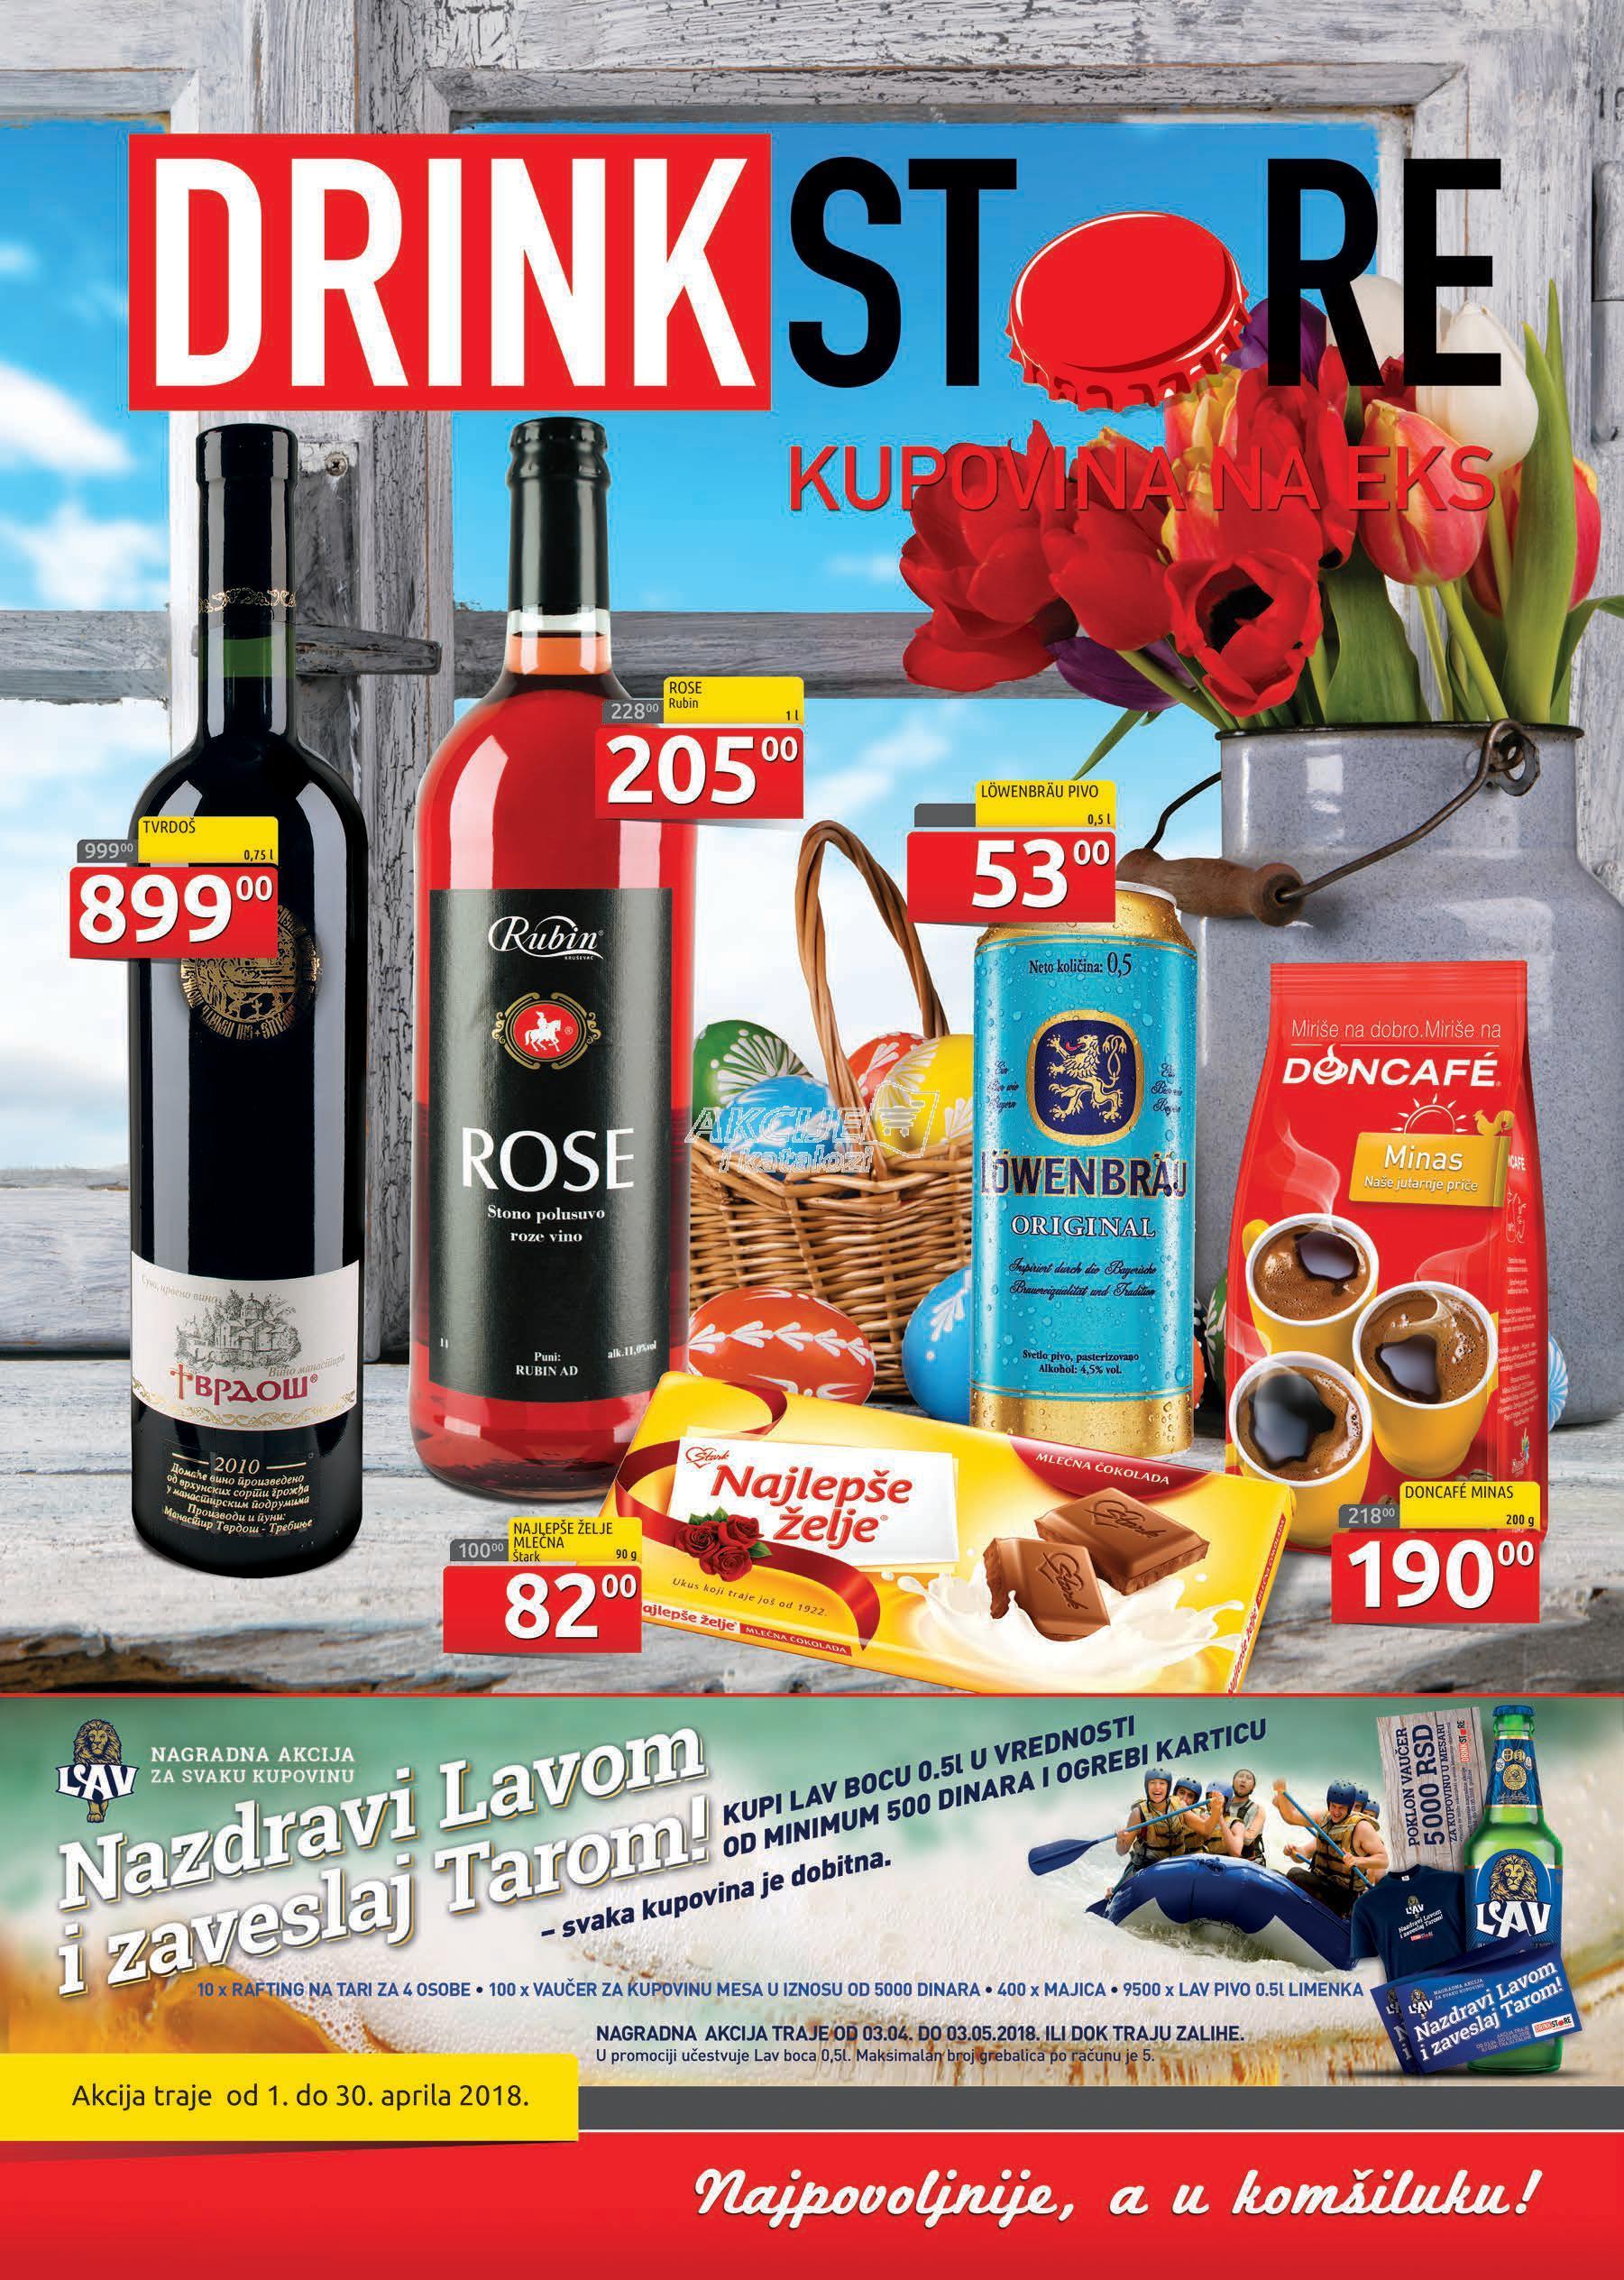 Drink Store - Redovna akcija aprilske kupovine